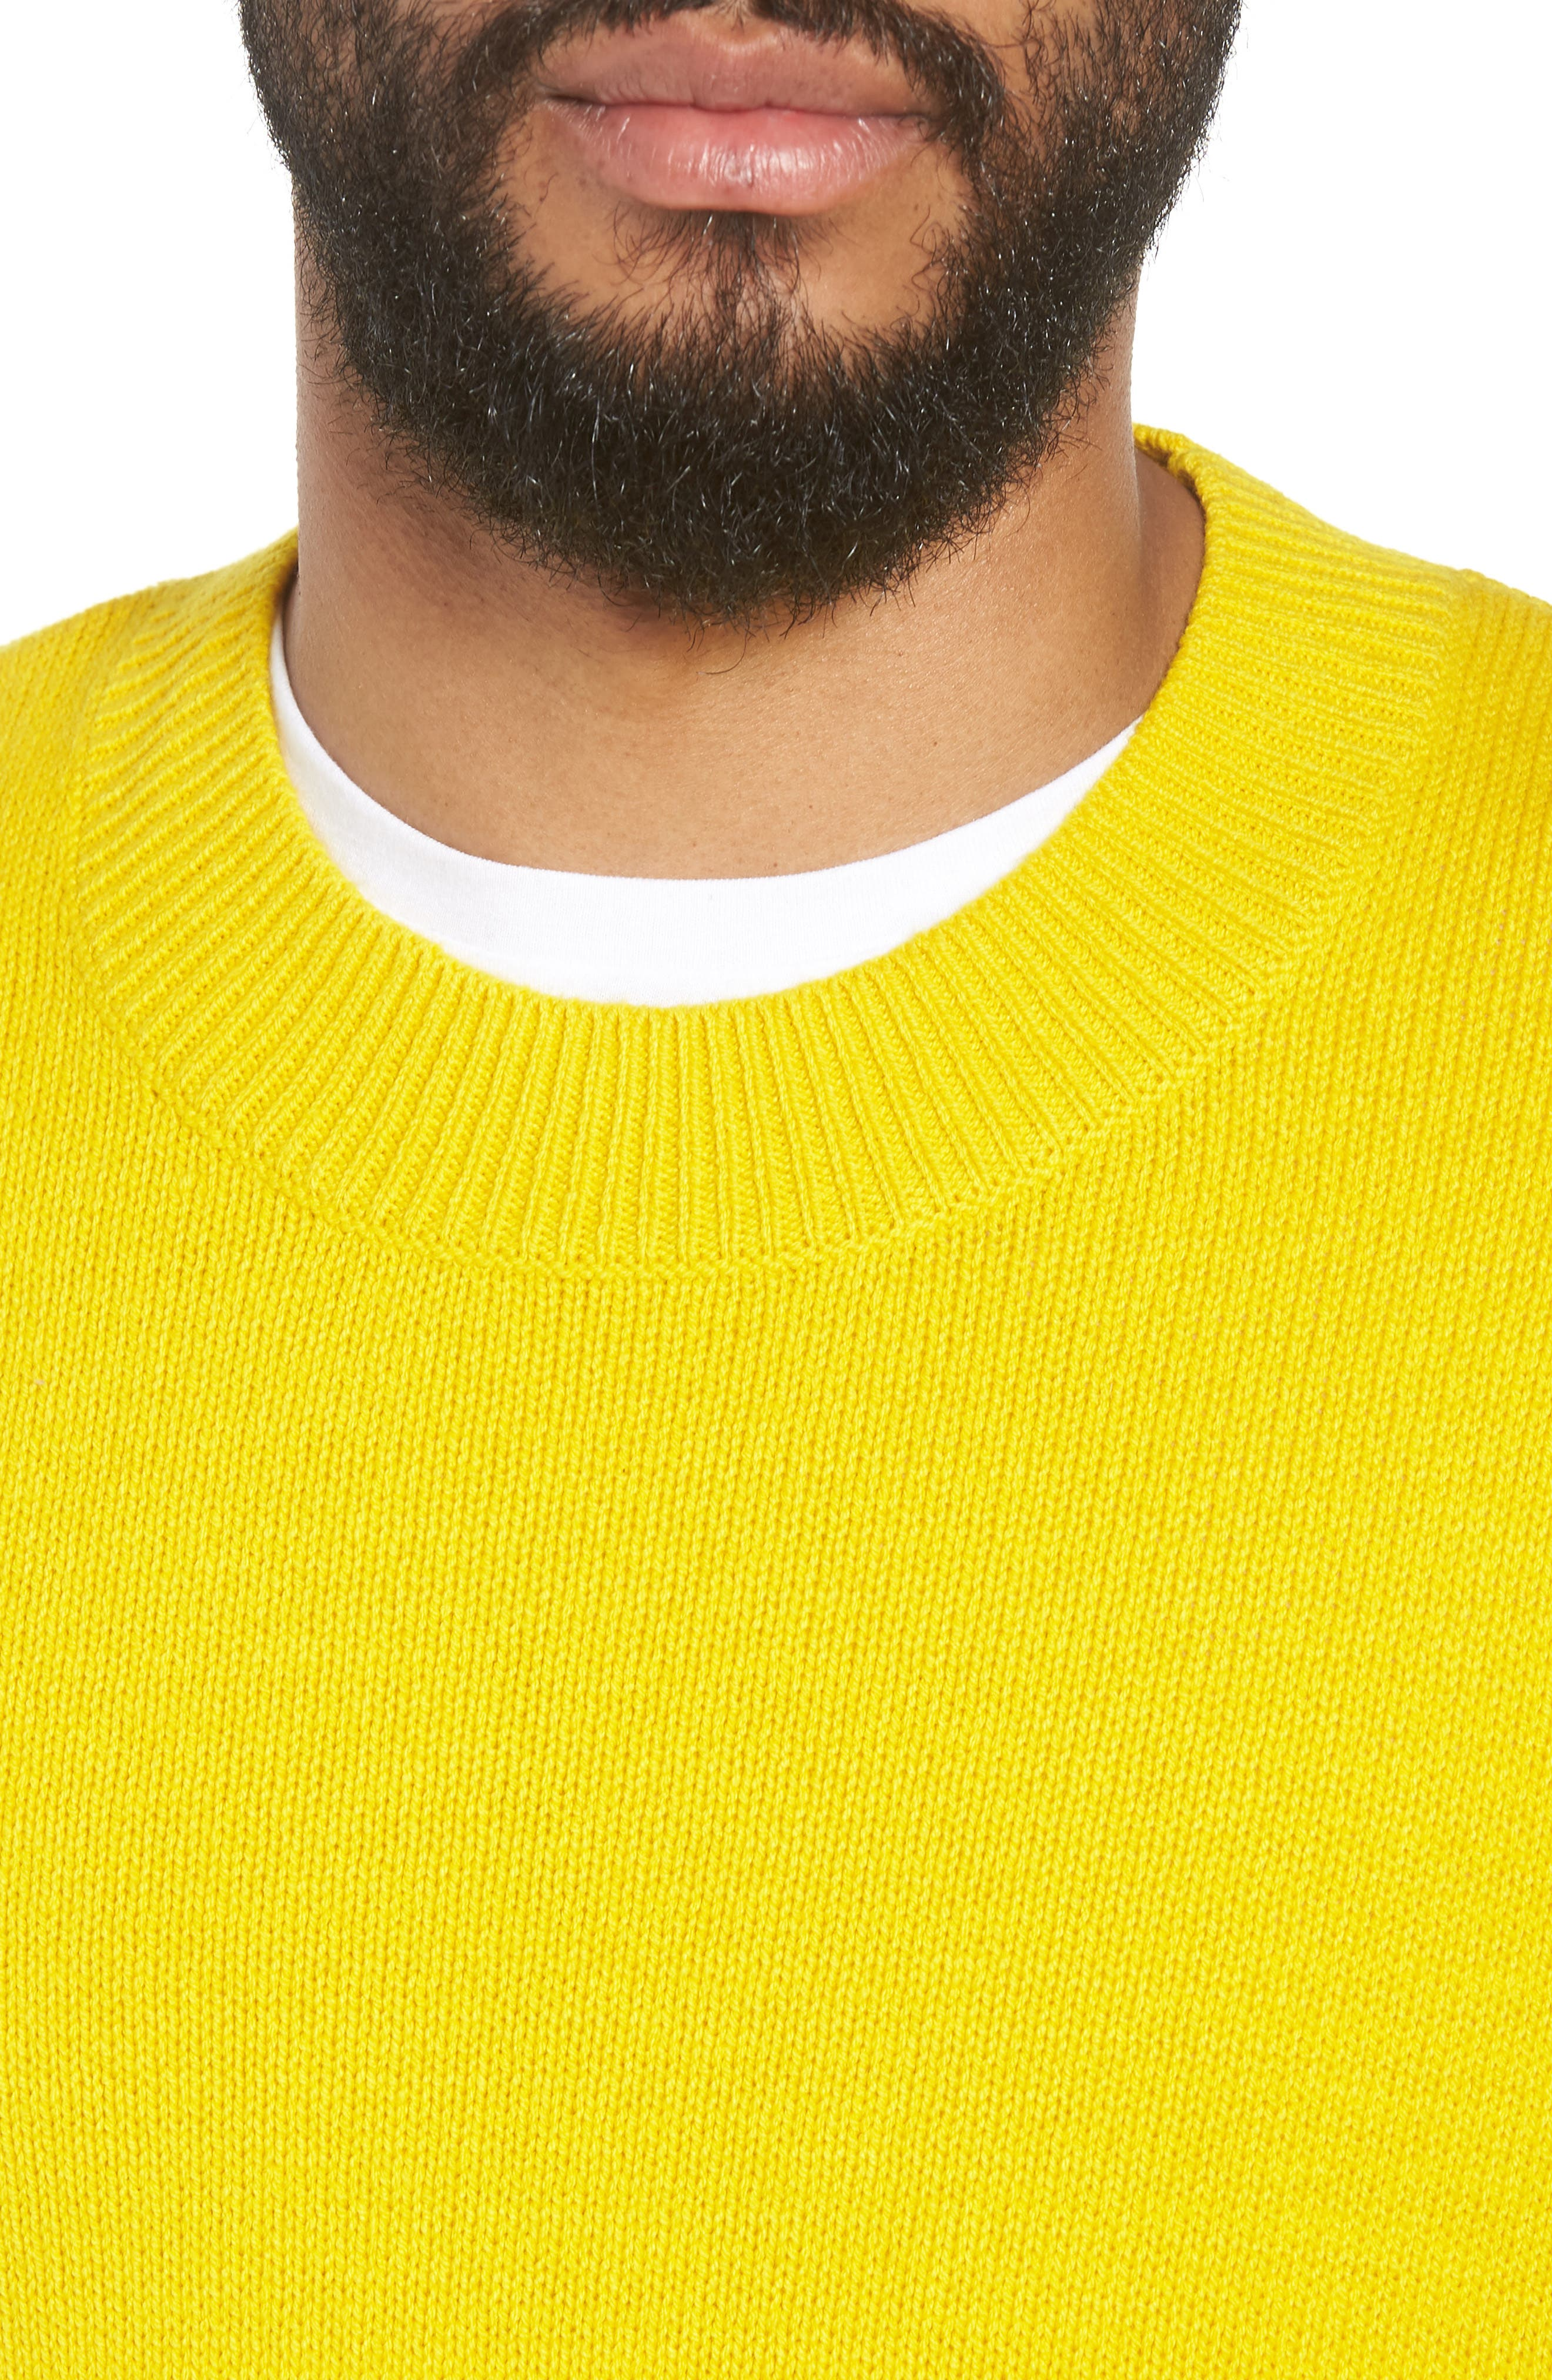 Crewneck Sweater,                             Alternate thumbnail 4, color,                             YELLOW SULPHUR